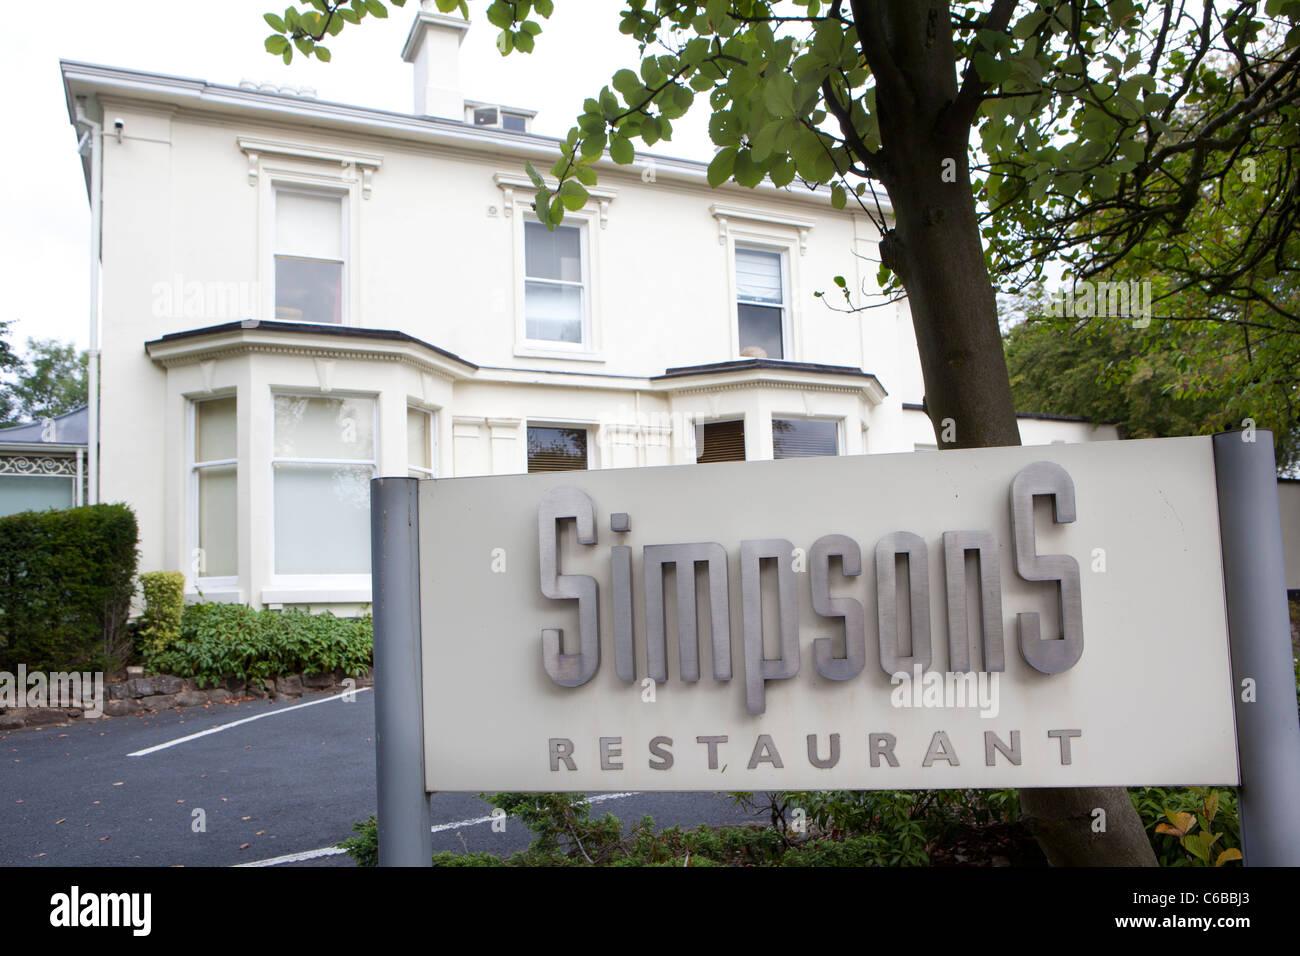 Simpsons restaurant, Edgbaston, Birmingham. Michellin starred restaurant. - Stock Image